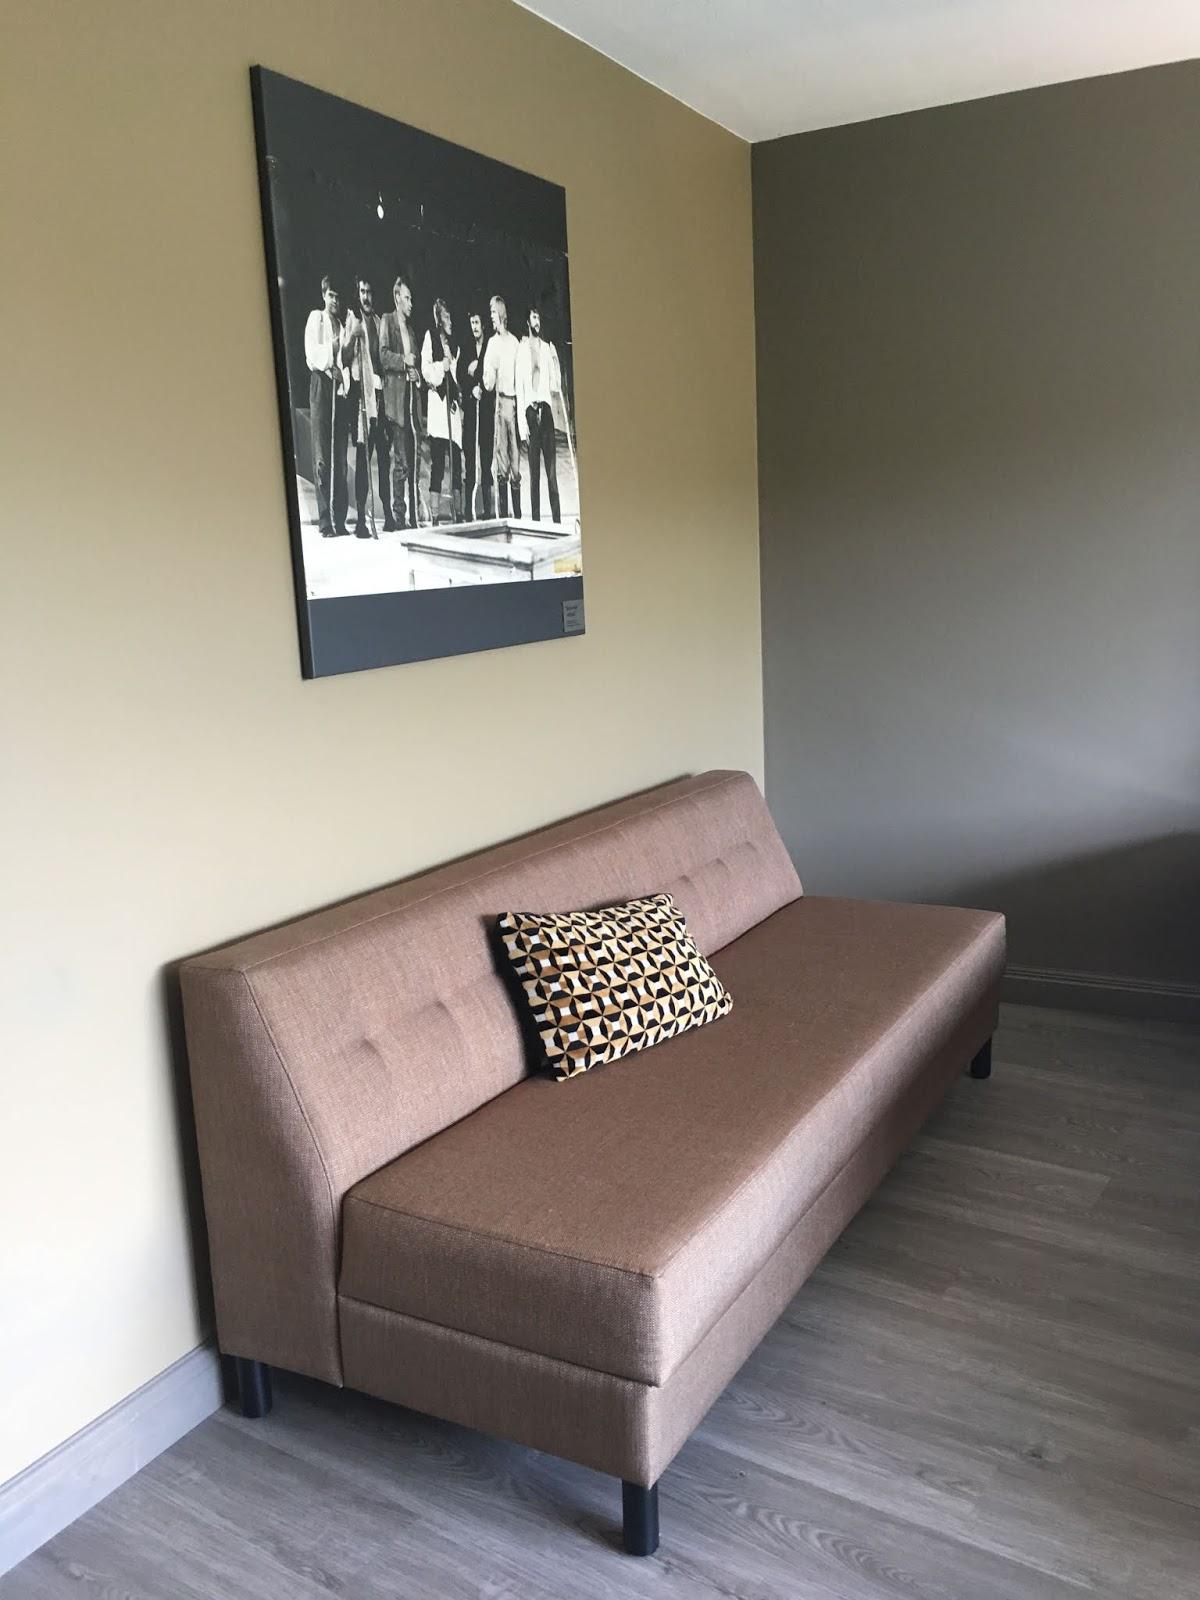 vaaleanpunainen sohva dating site UK